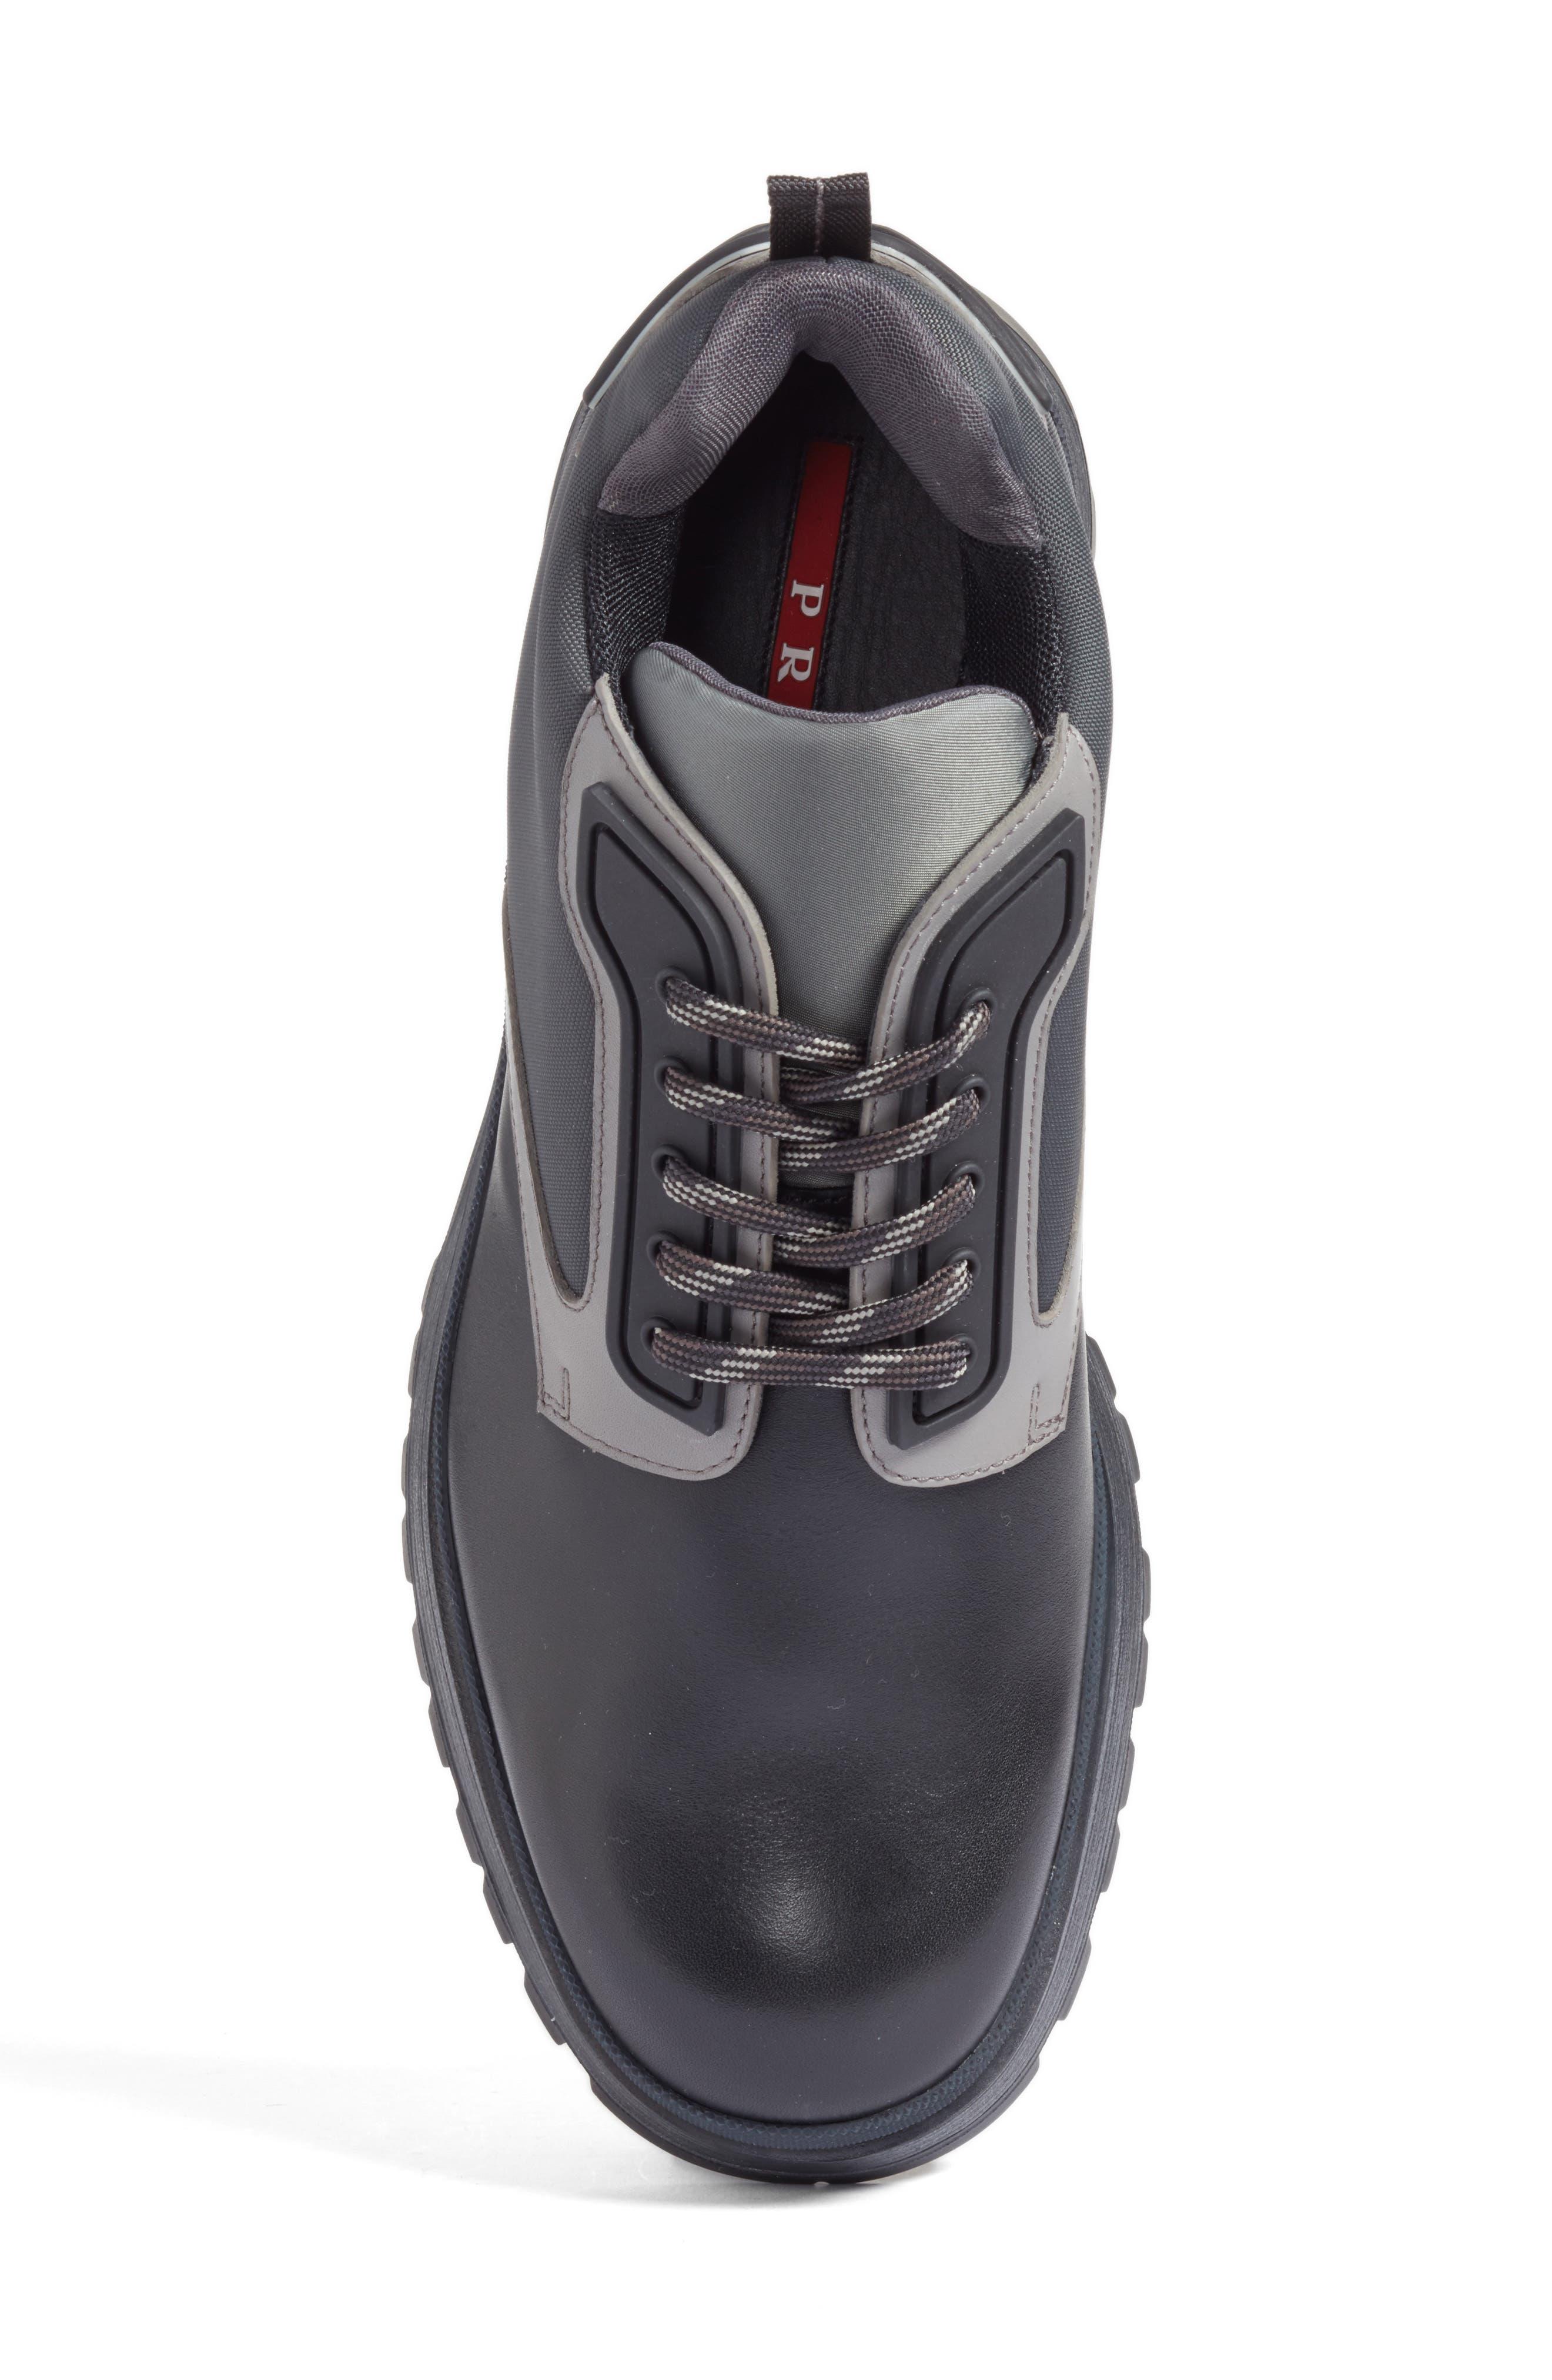 Tech Sneaker Boot,                             Alternate thumbnail 5, color,                             007